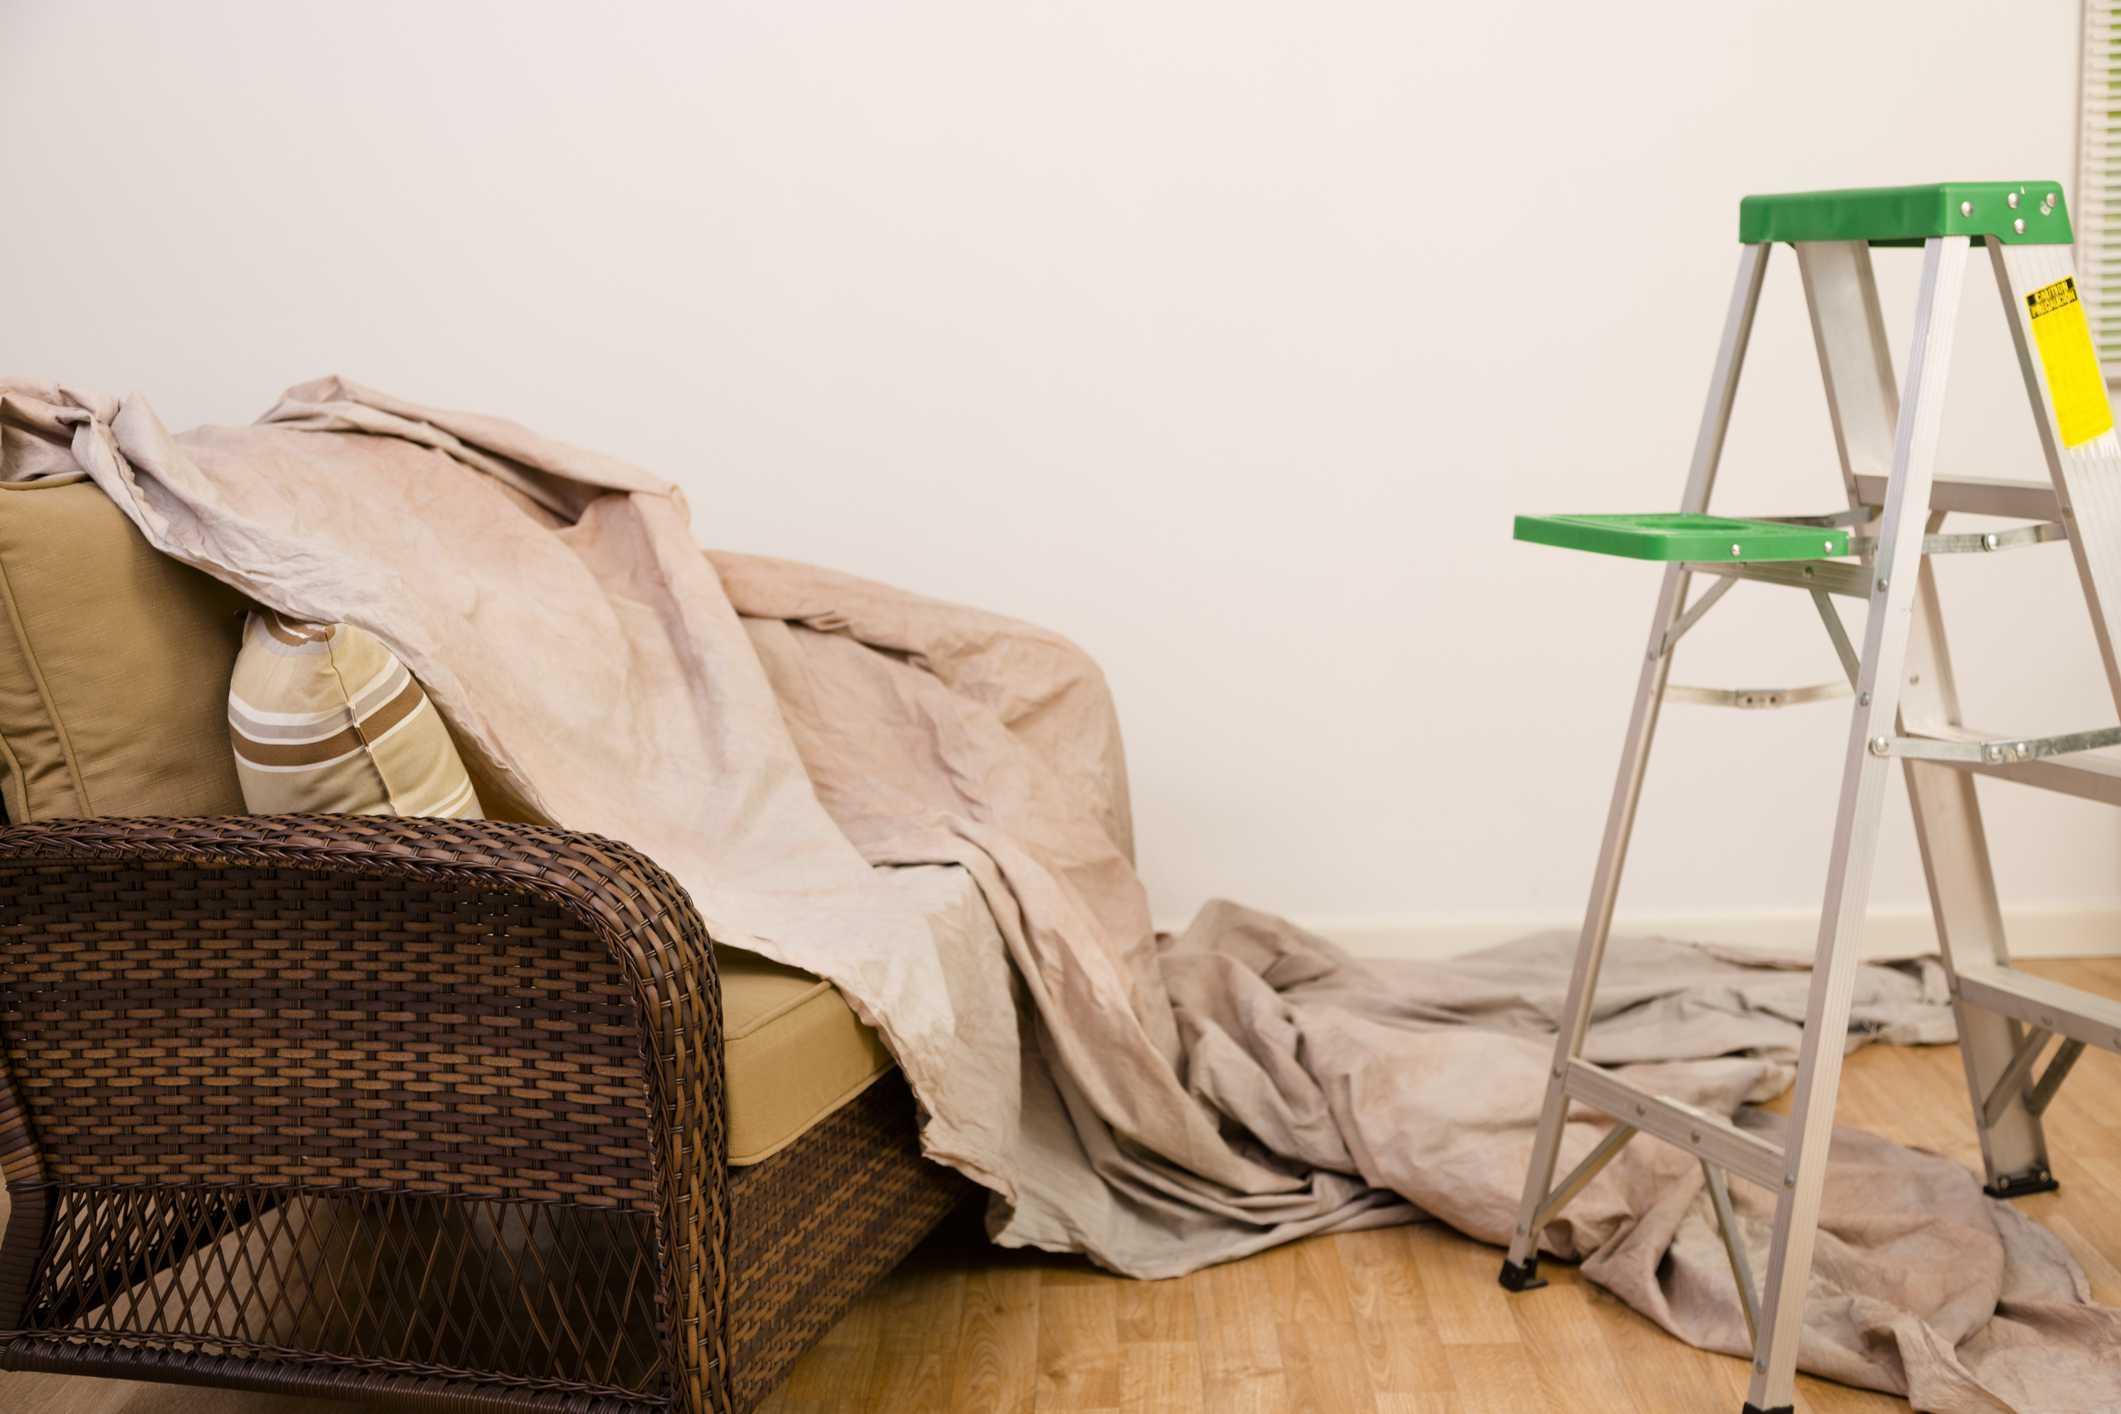 Drop cloth over furniture